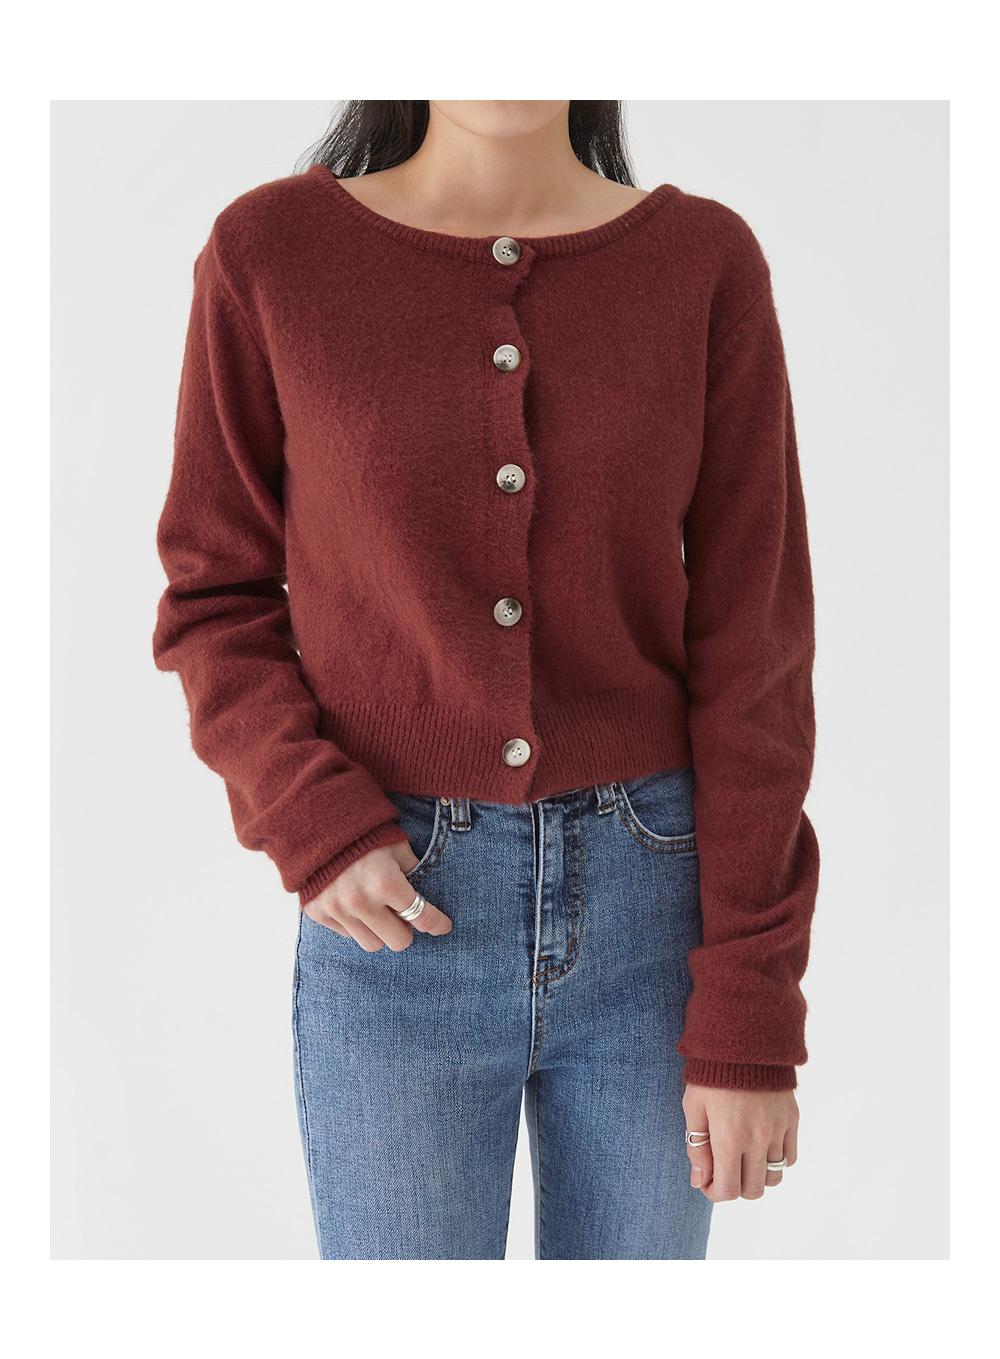 dally girl crop cardigan